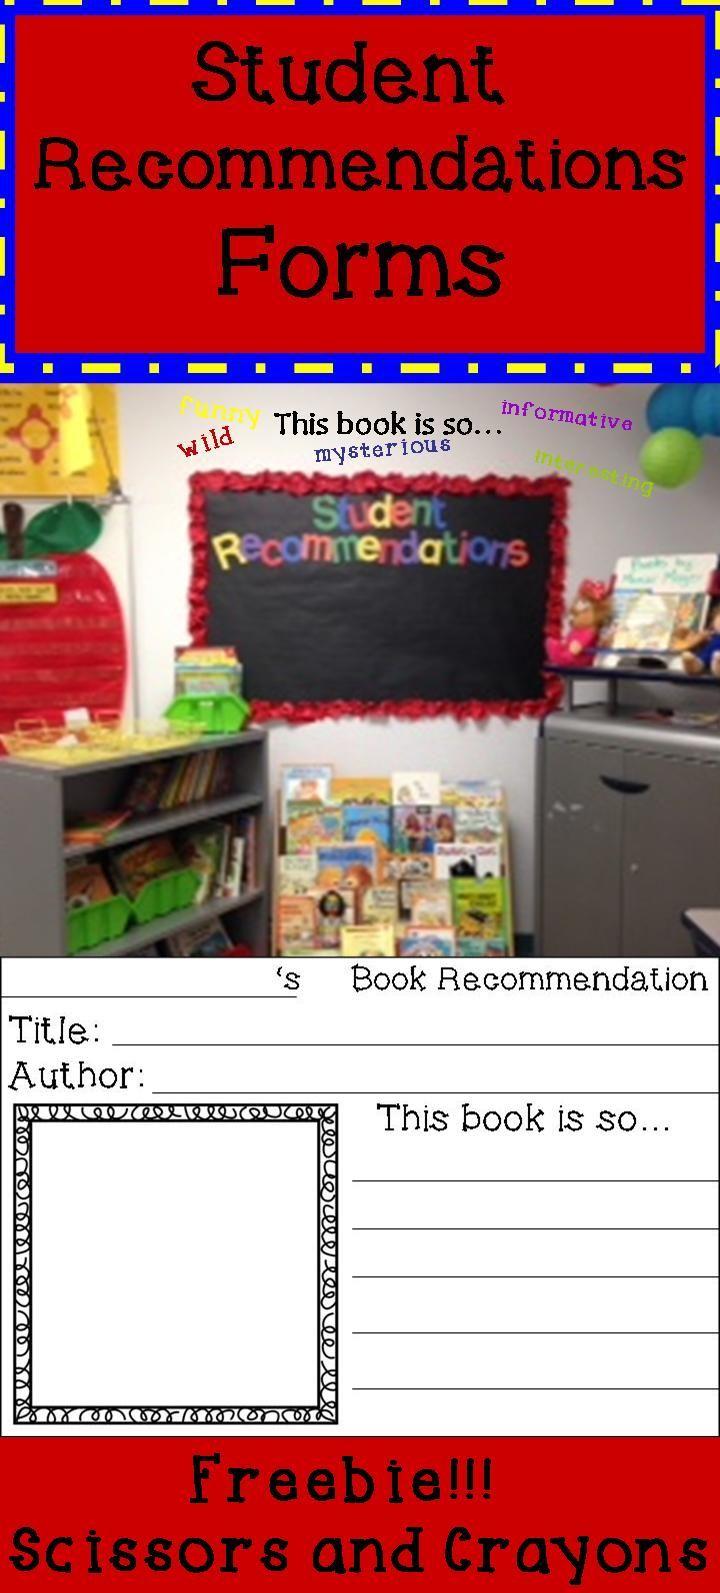 peer recommendation sample